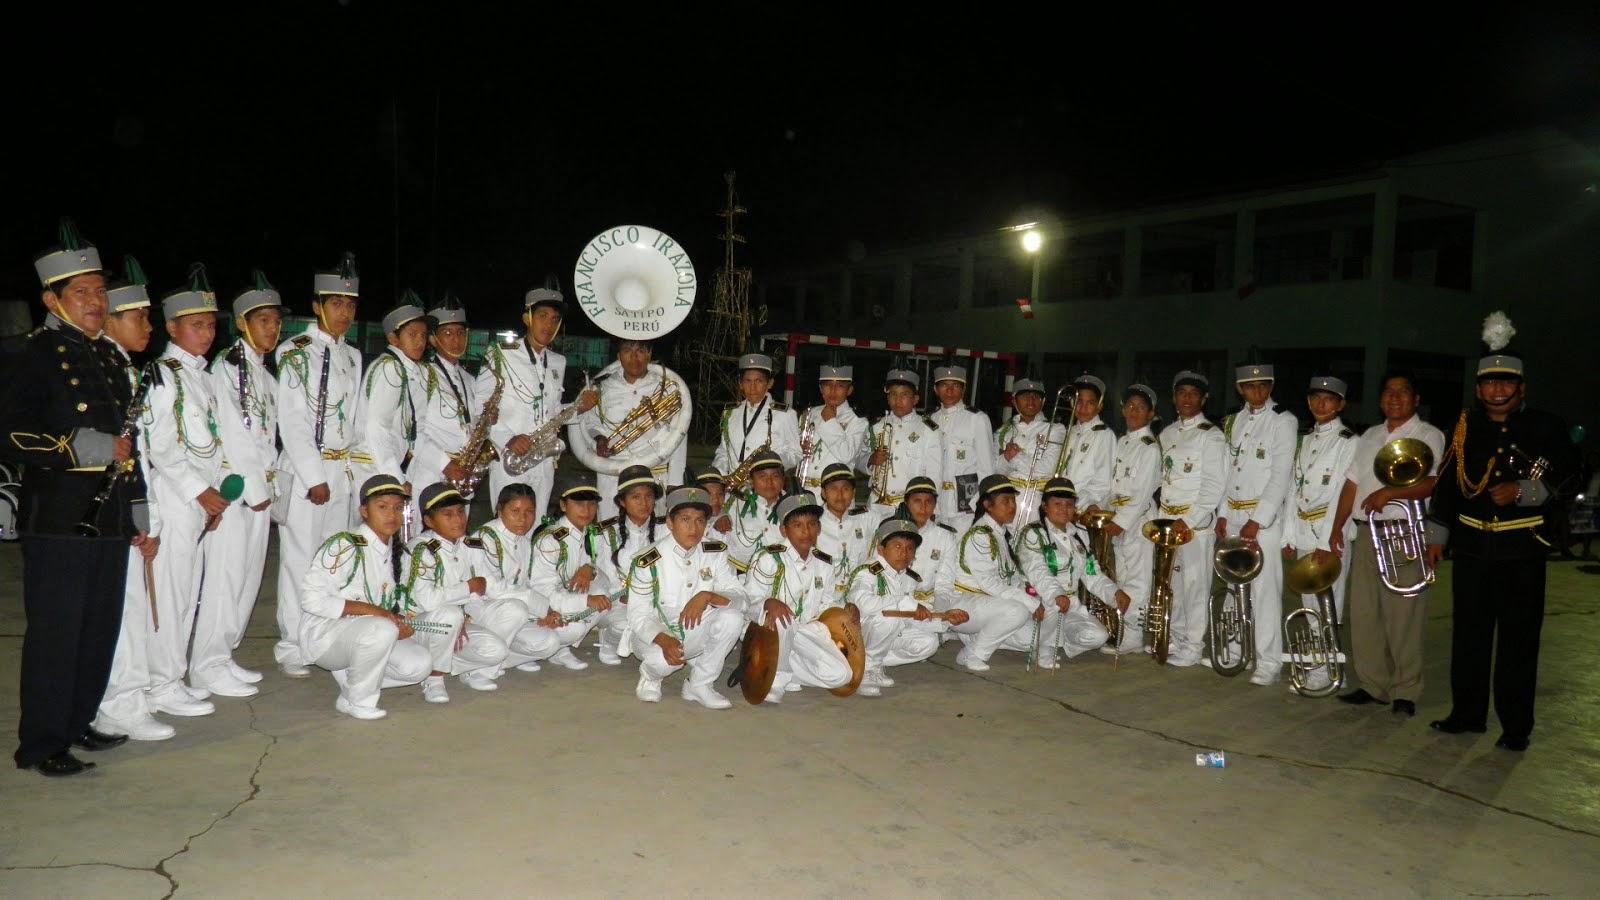 Banda de Músicos 2014